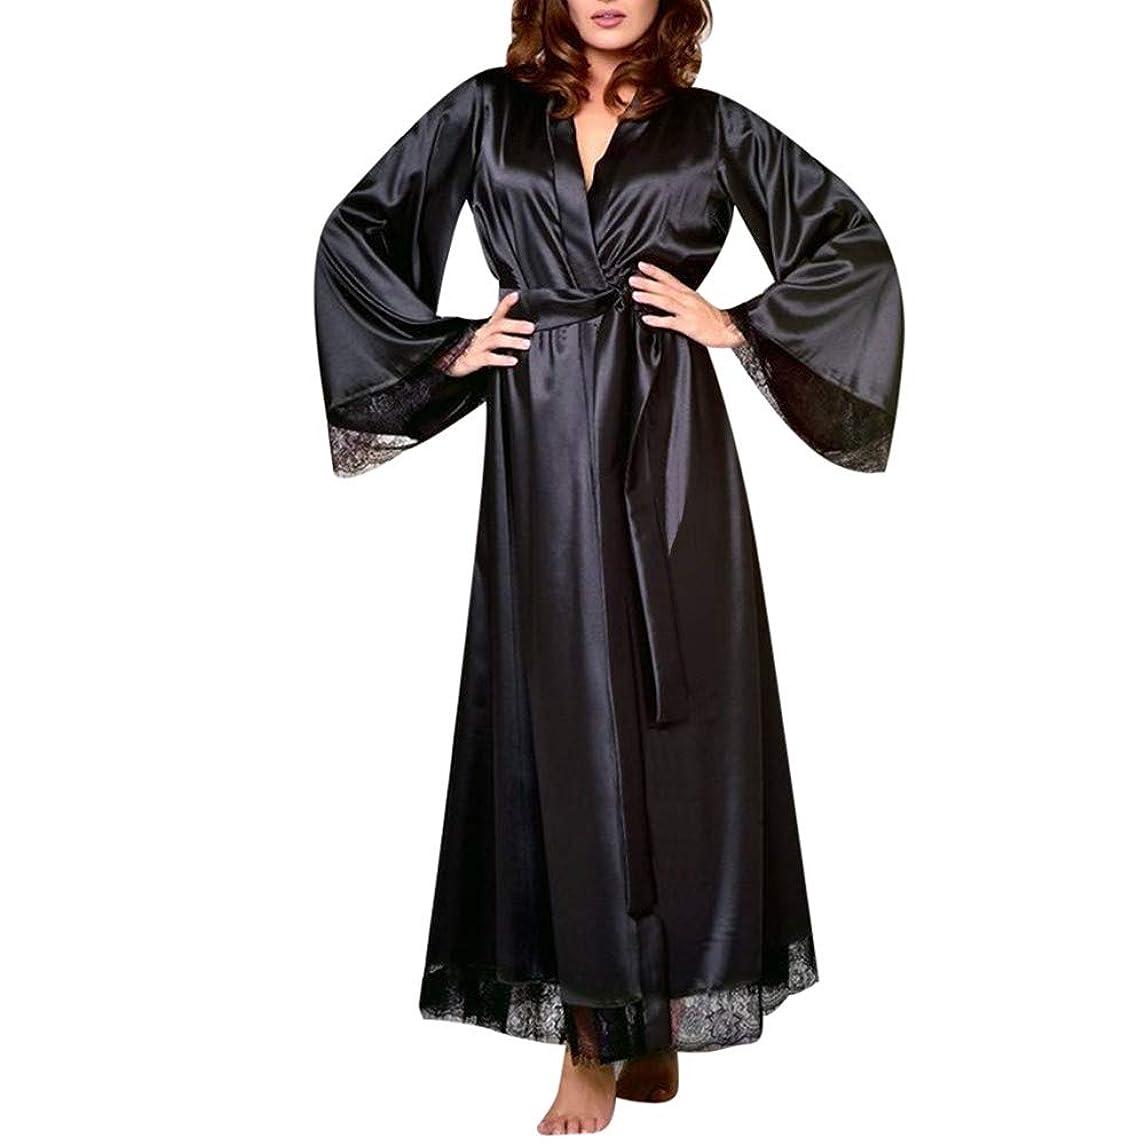 Women Sexy Long Silk Kimono Robe Oblique V-Neck Elegant Nightgown Bathrobe Babydoll Lingerie Nightdress